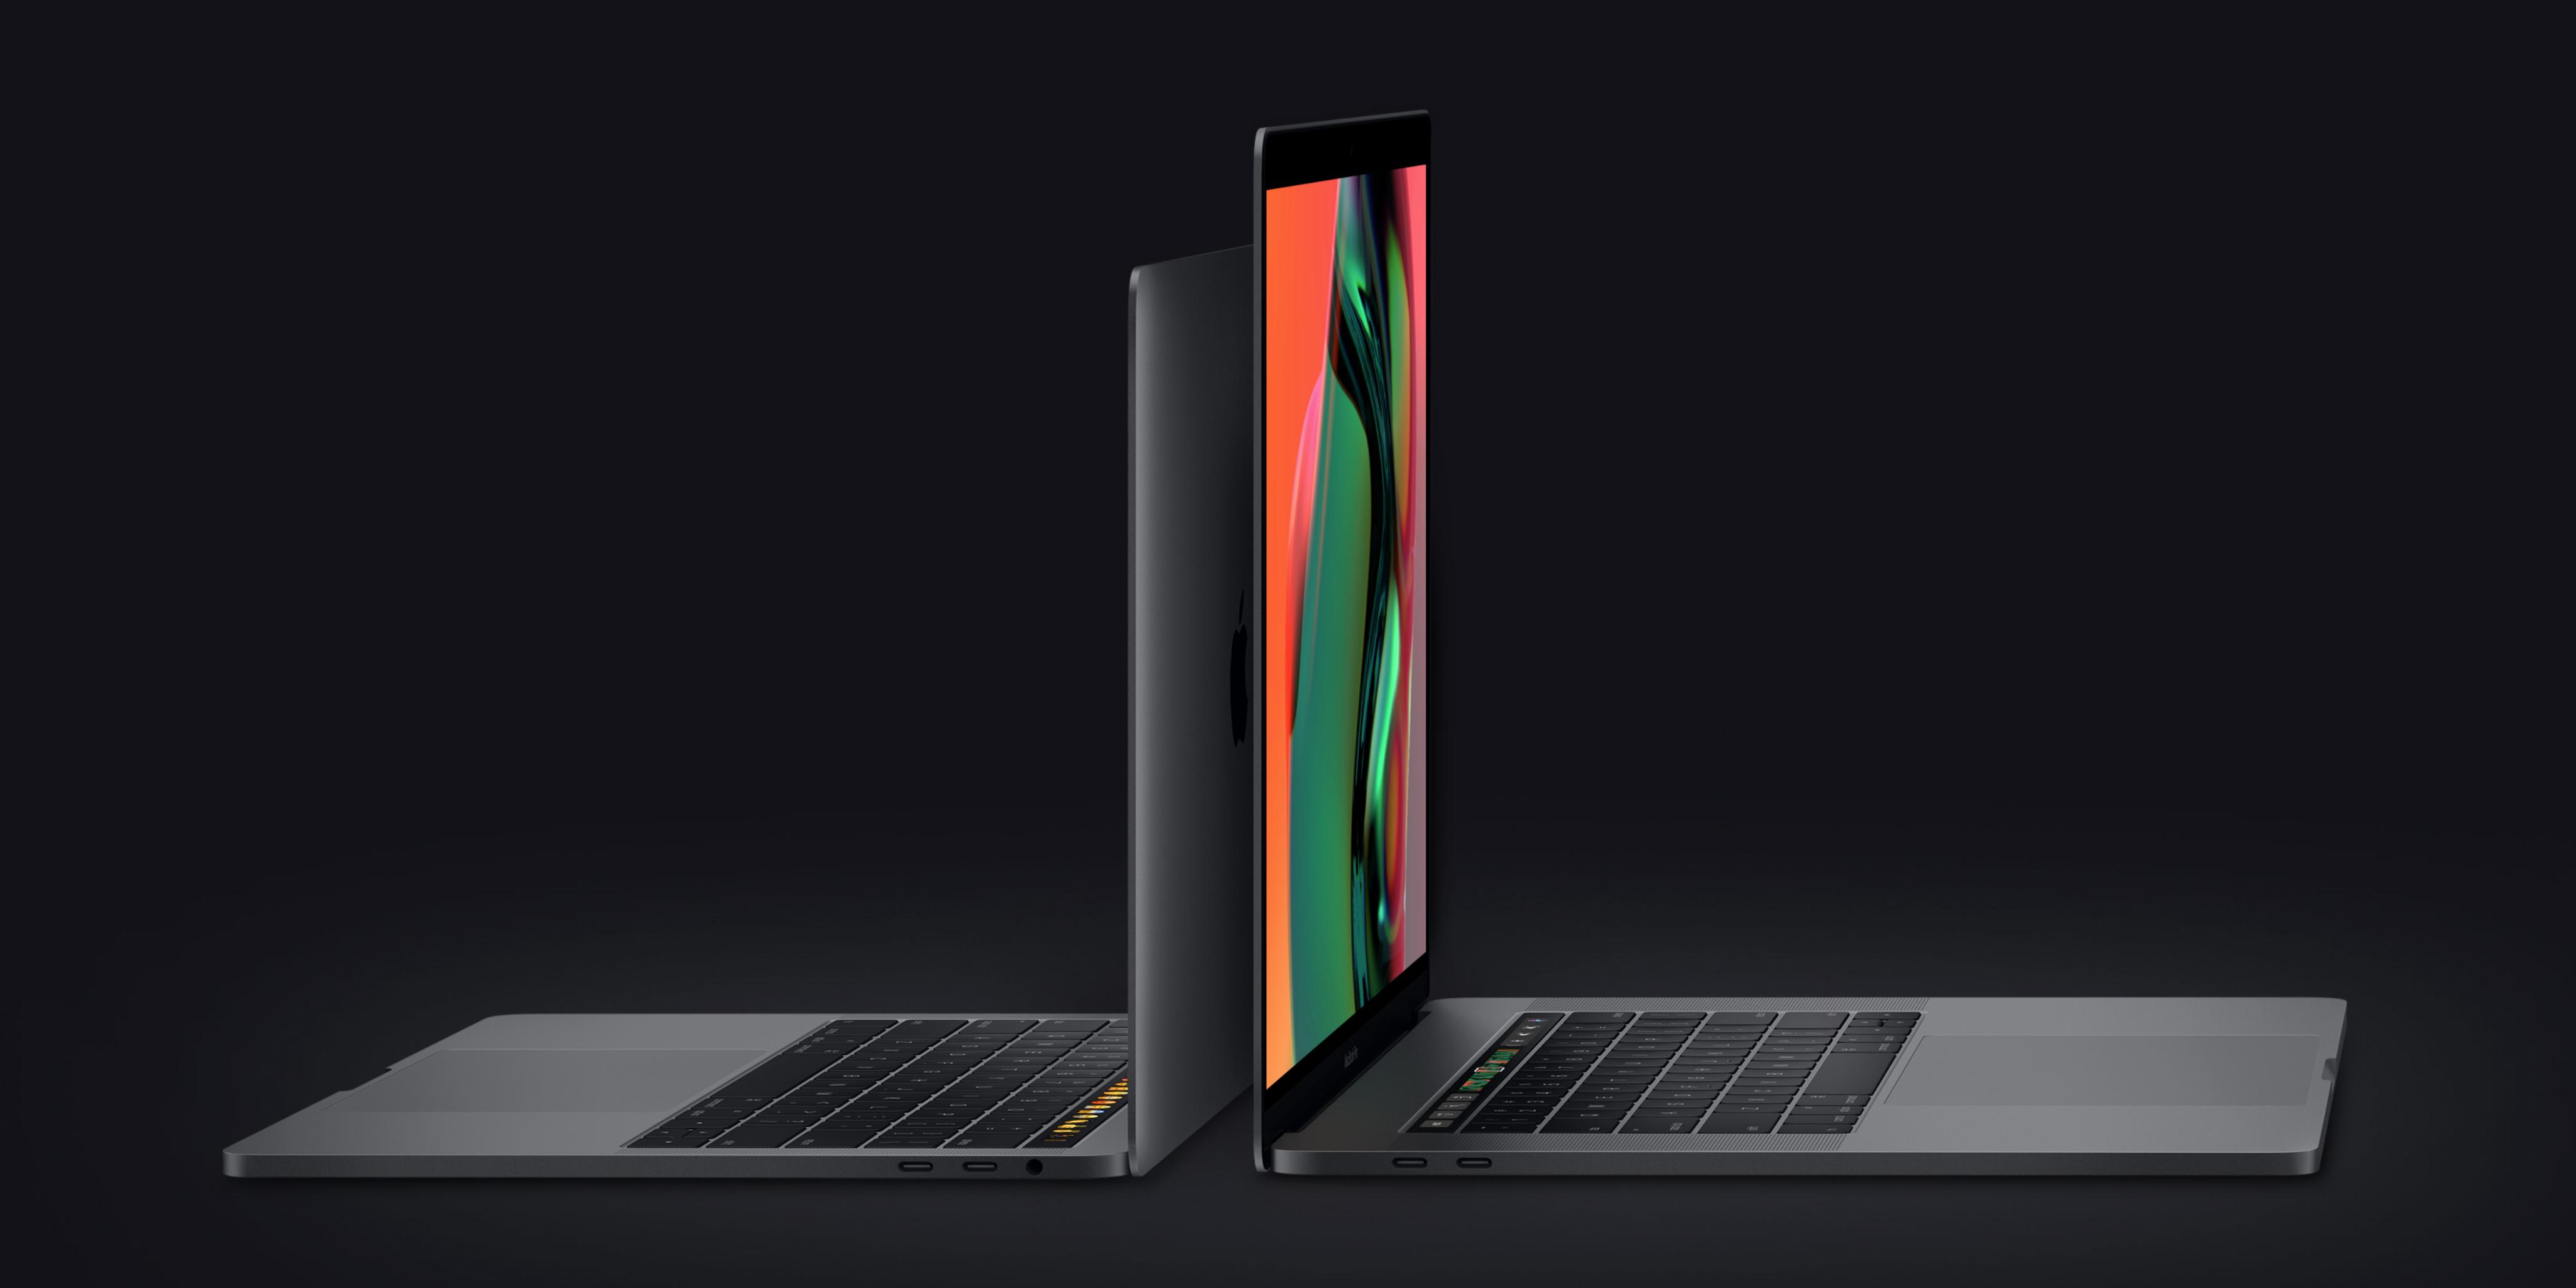 Take $399 off Apple's latest 15-inch MacBook Pro 512GB